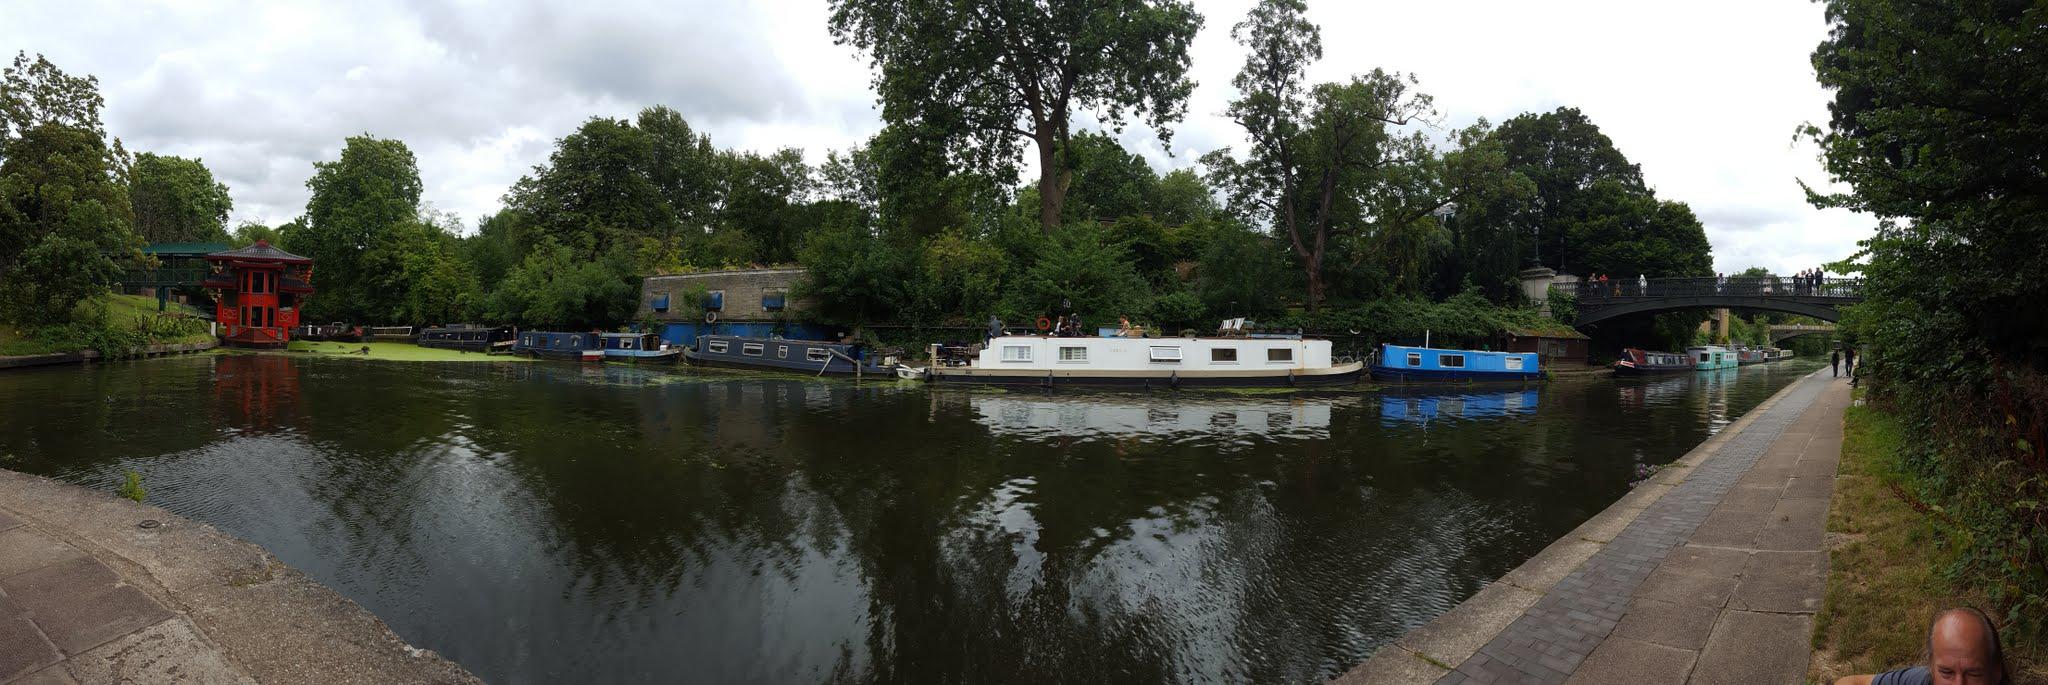 Regent's Canal 2016